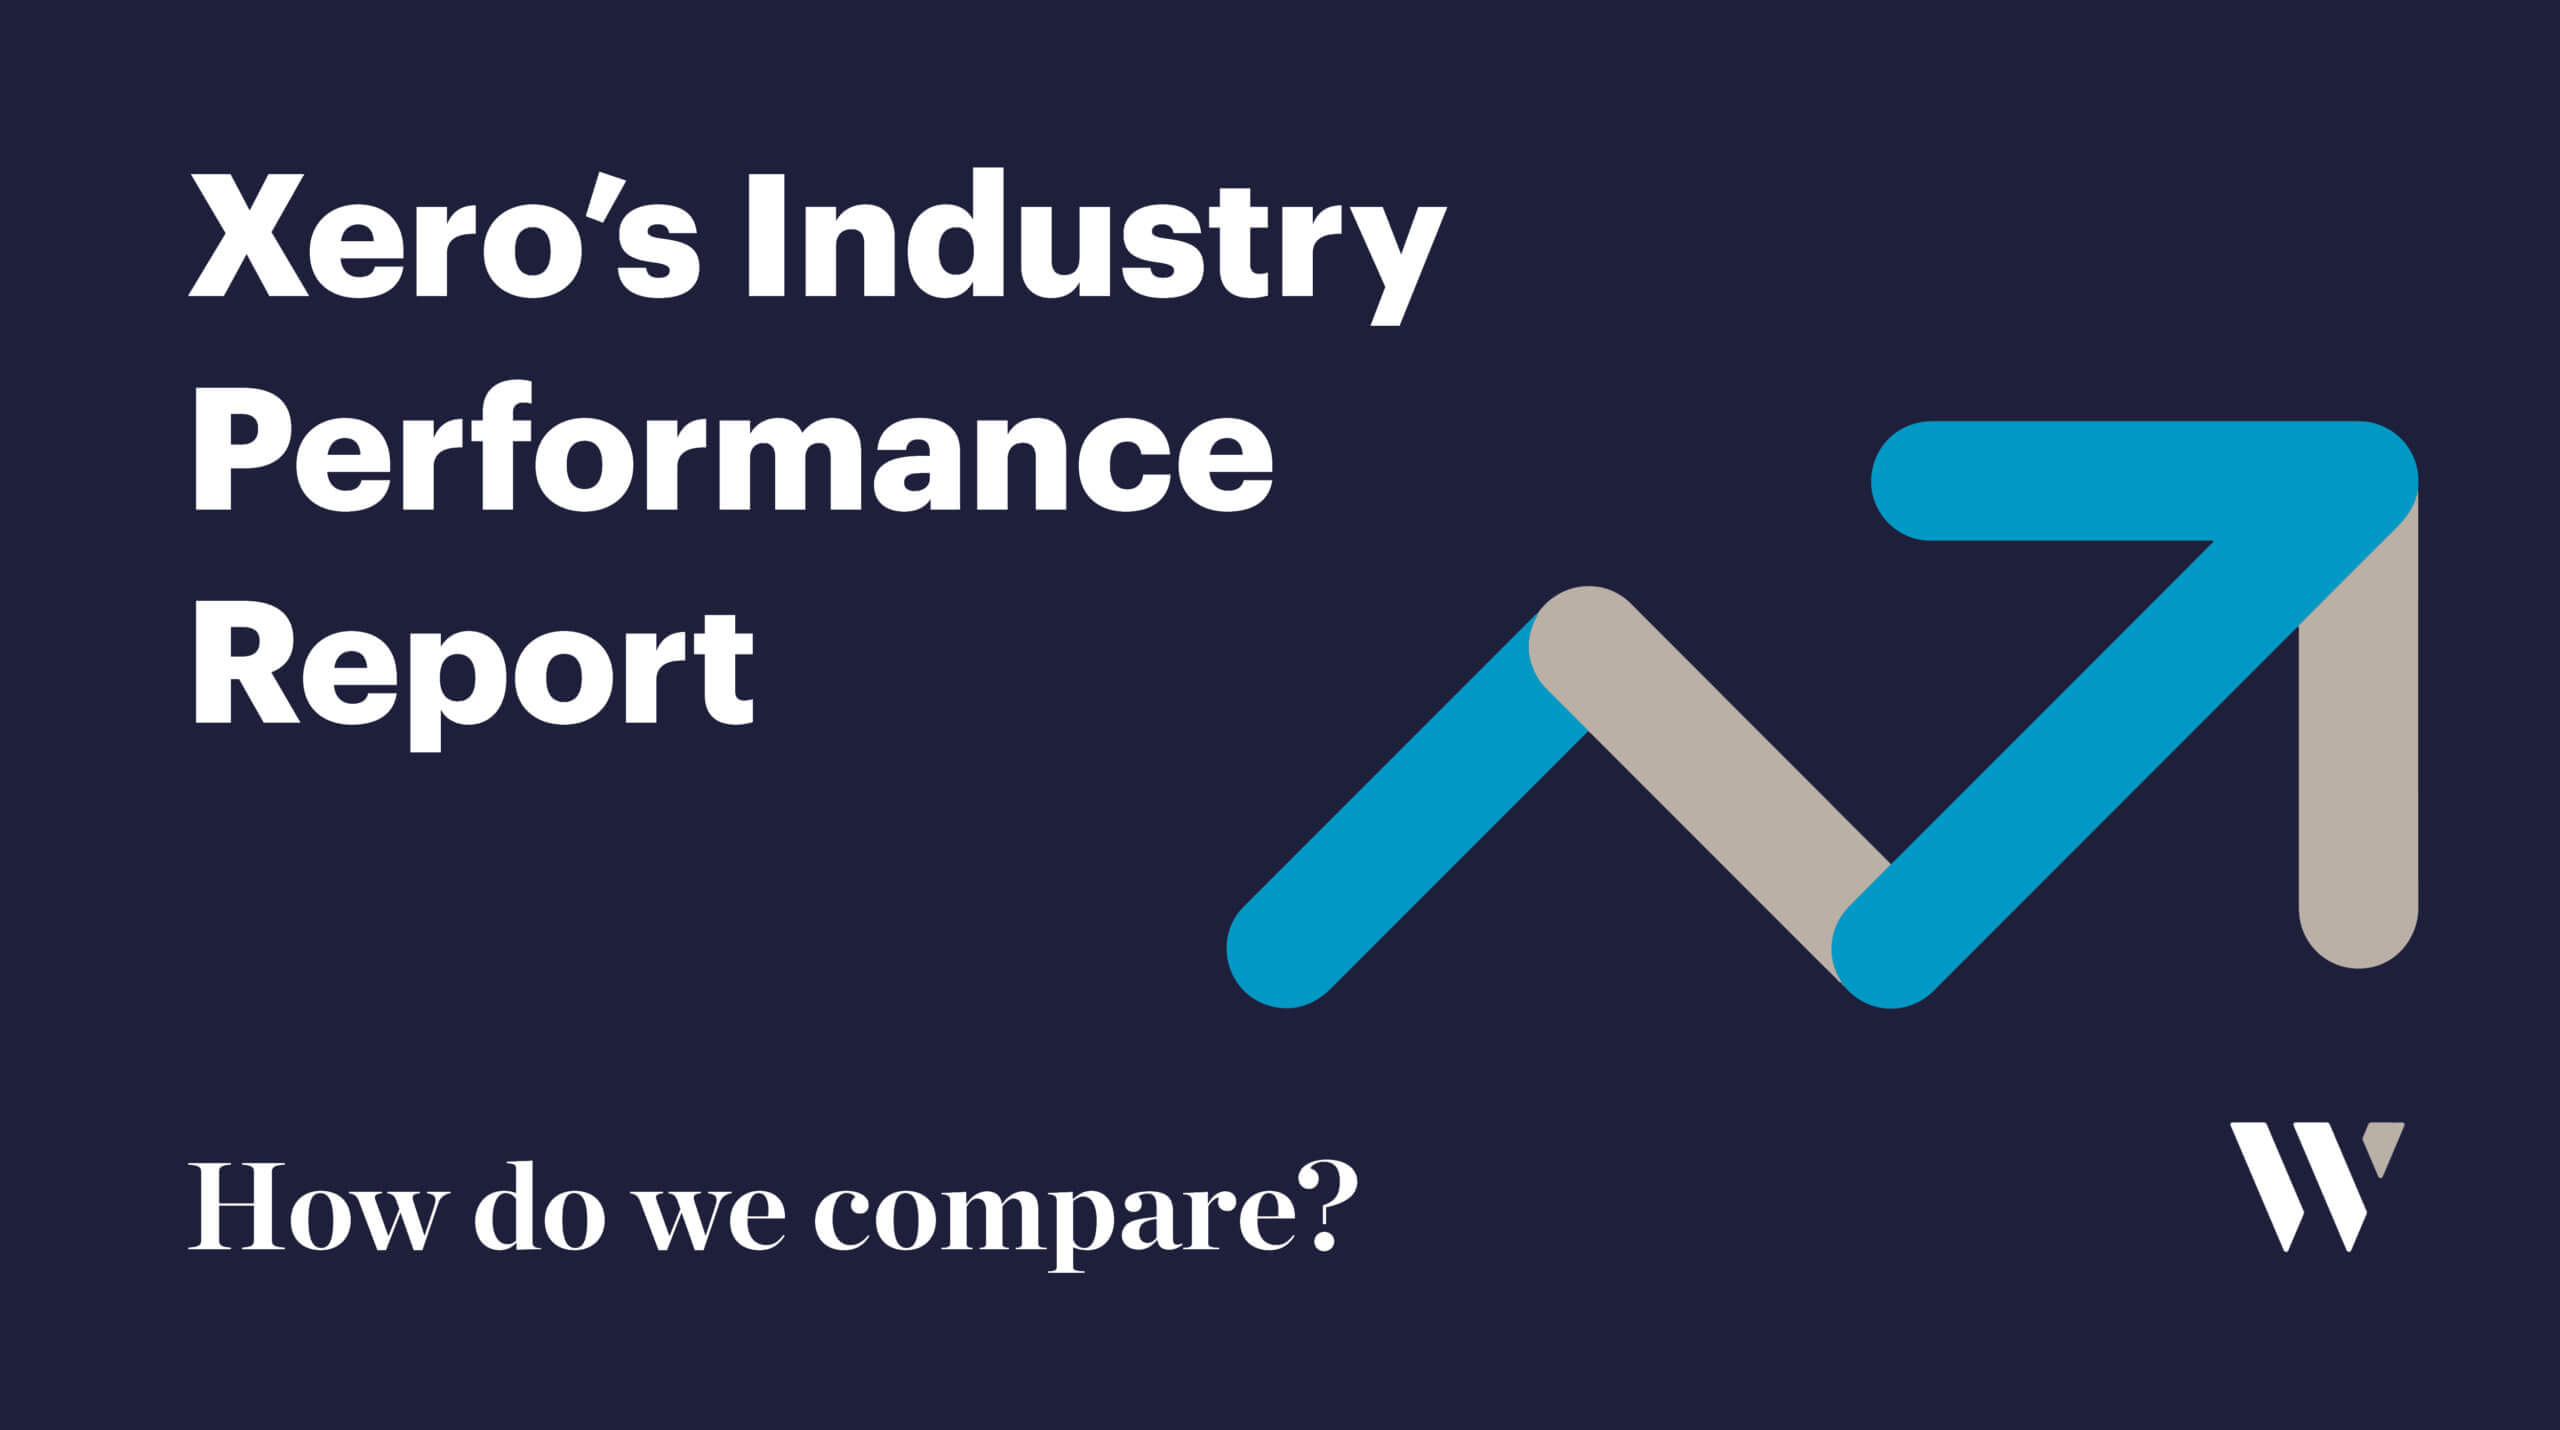 Xero's Industry Performance Report